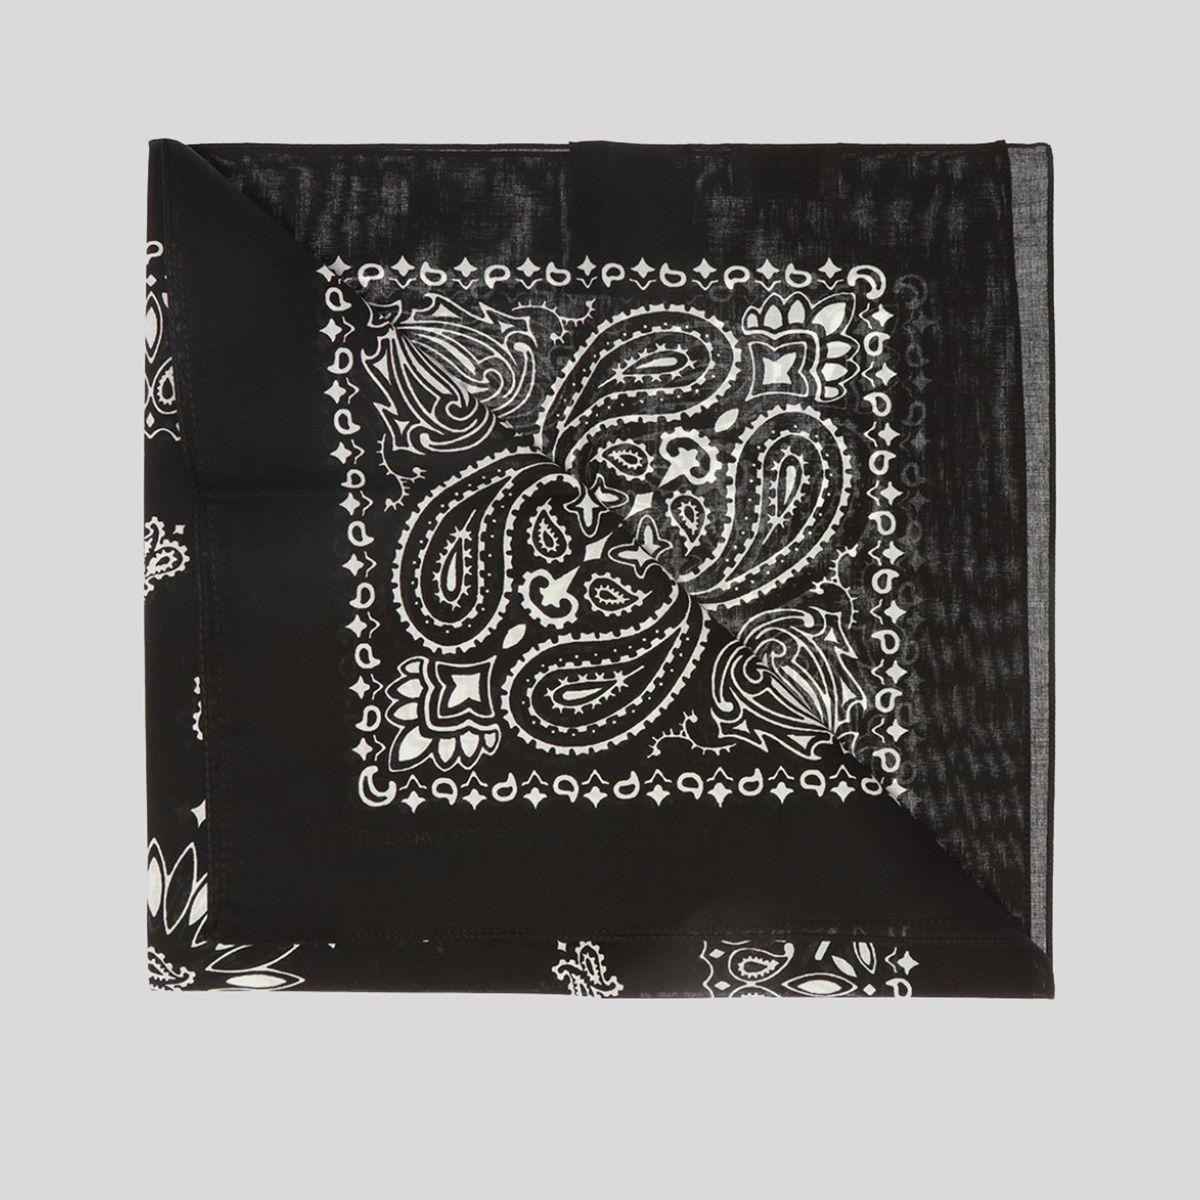 SAINT LAURENT サンローラン バンダナ スクエアスカーフ イン ペイズリー プリント コットン Bandana Square Scarf In Paisley Printed Cotton